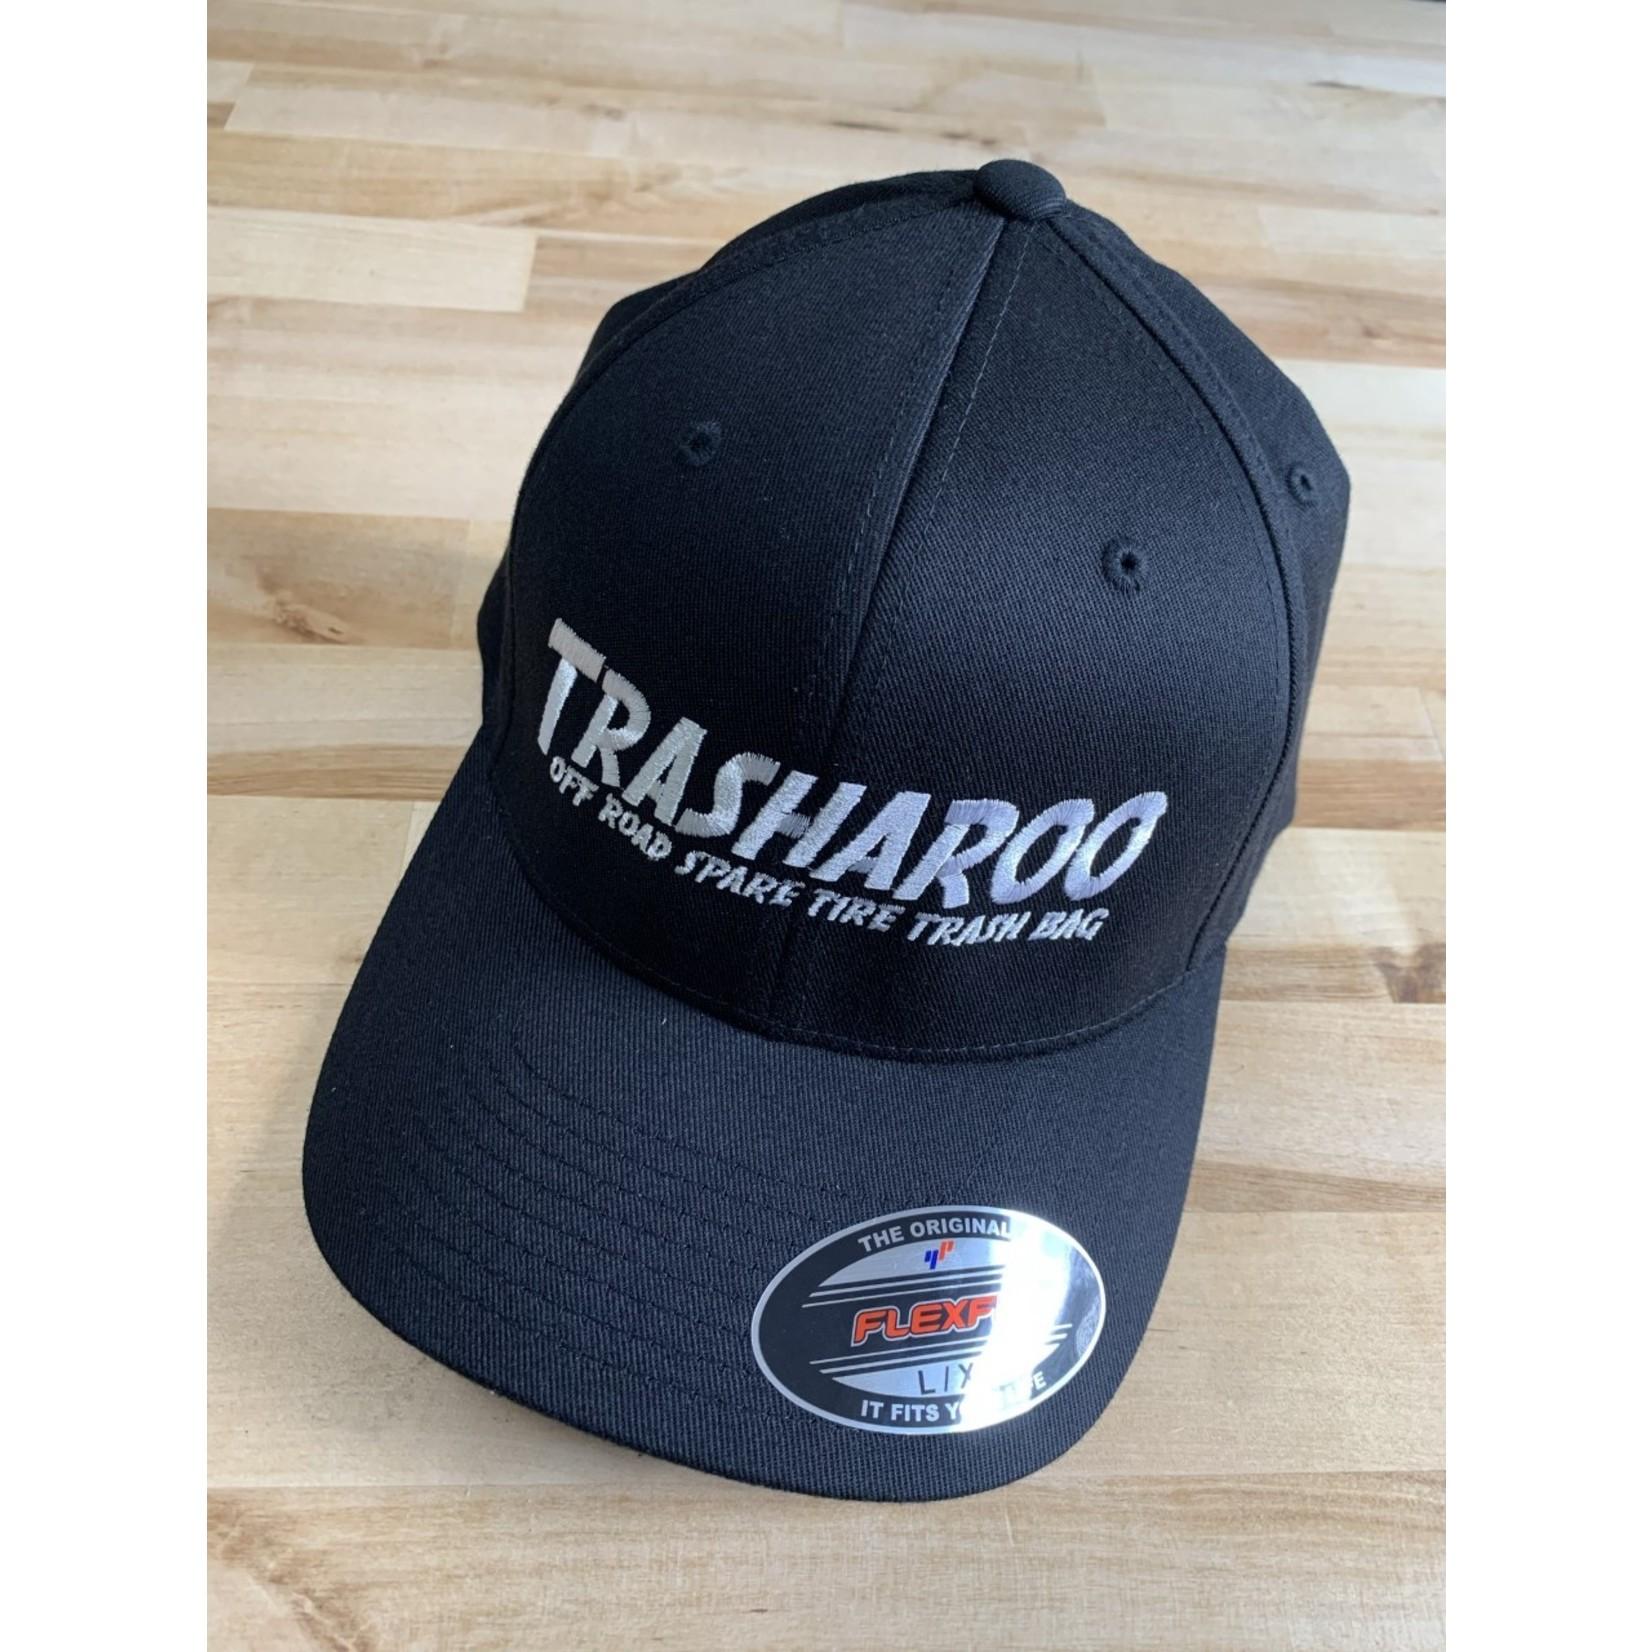 Trasharoo FlexFit Hat Black